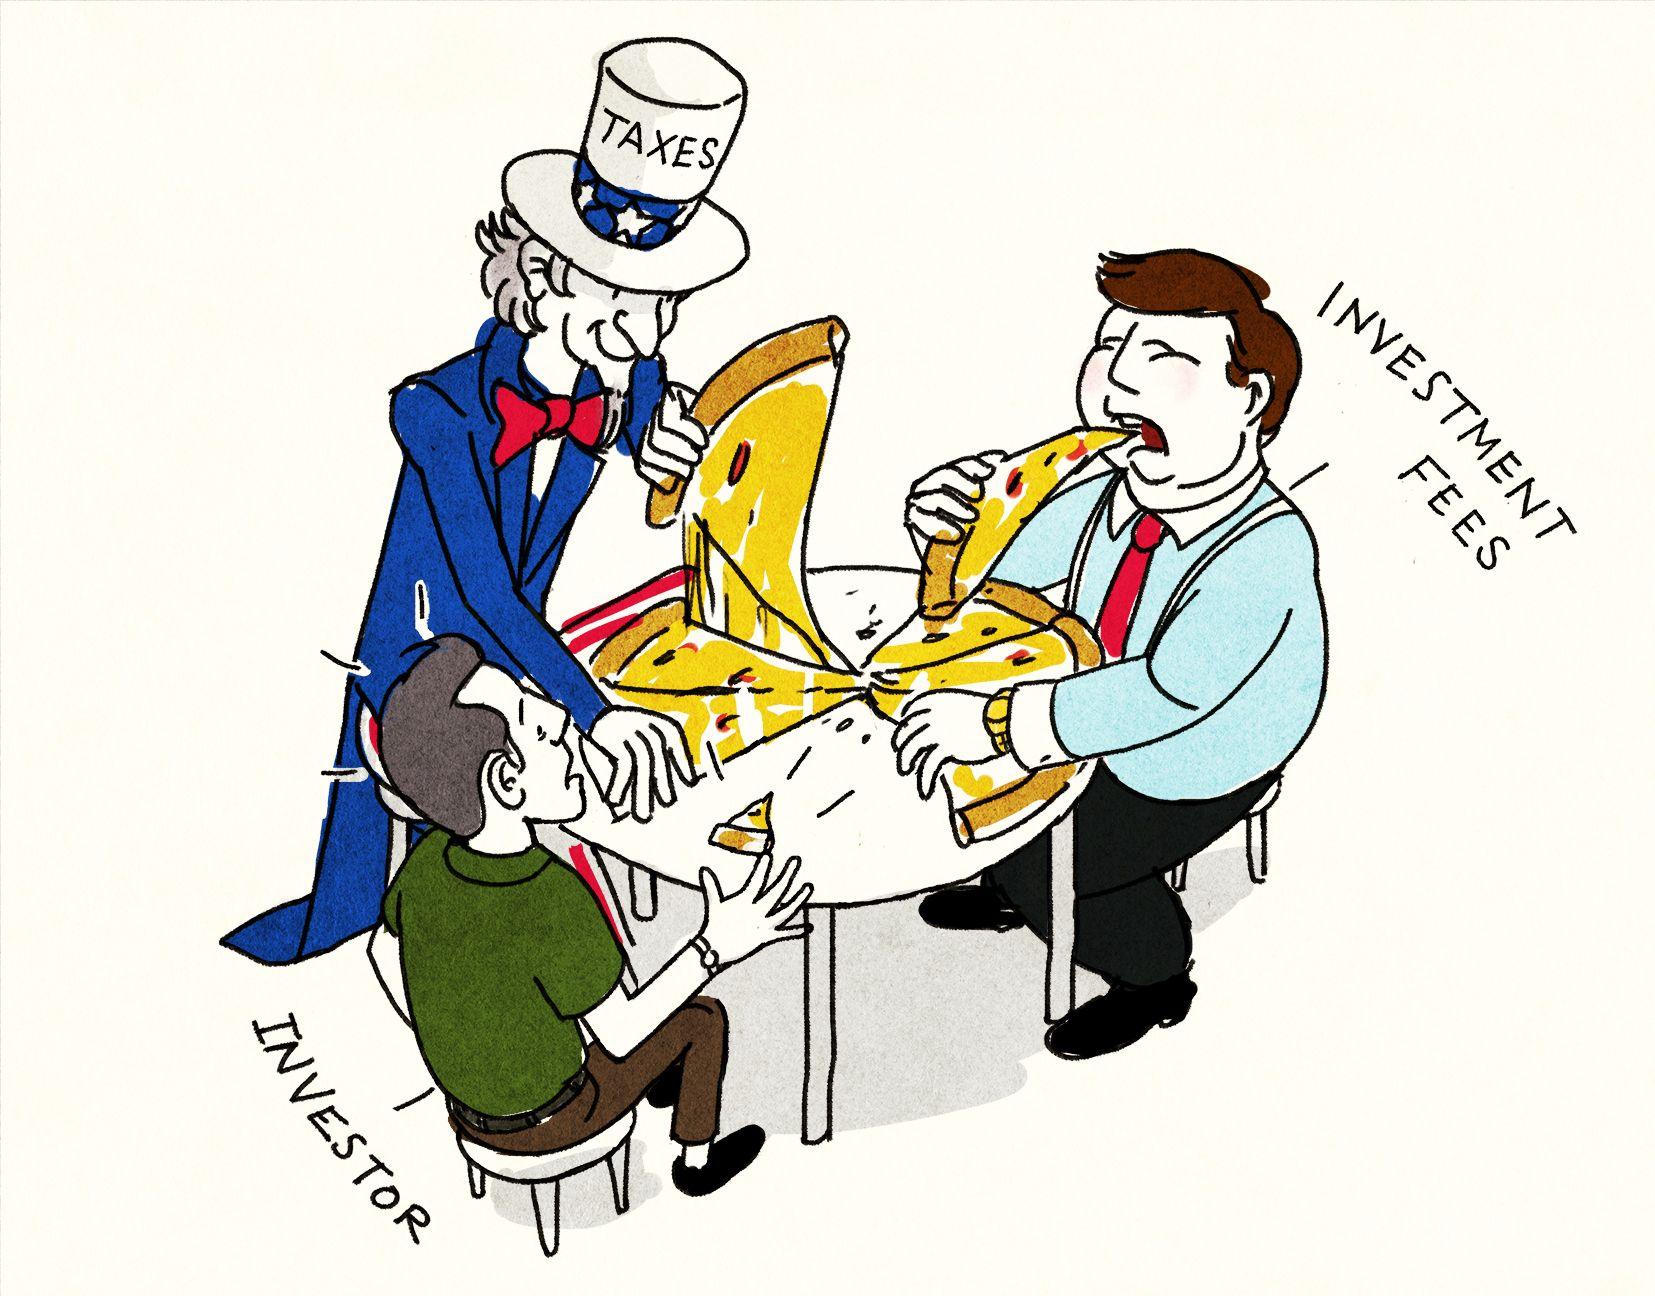 tax-pie-illustration-high-res